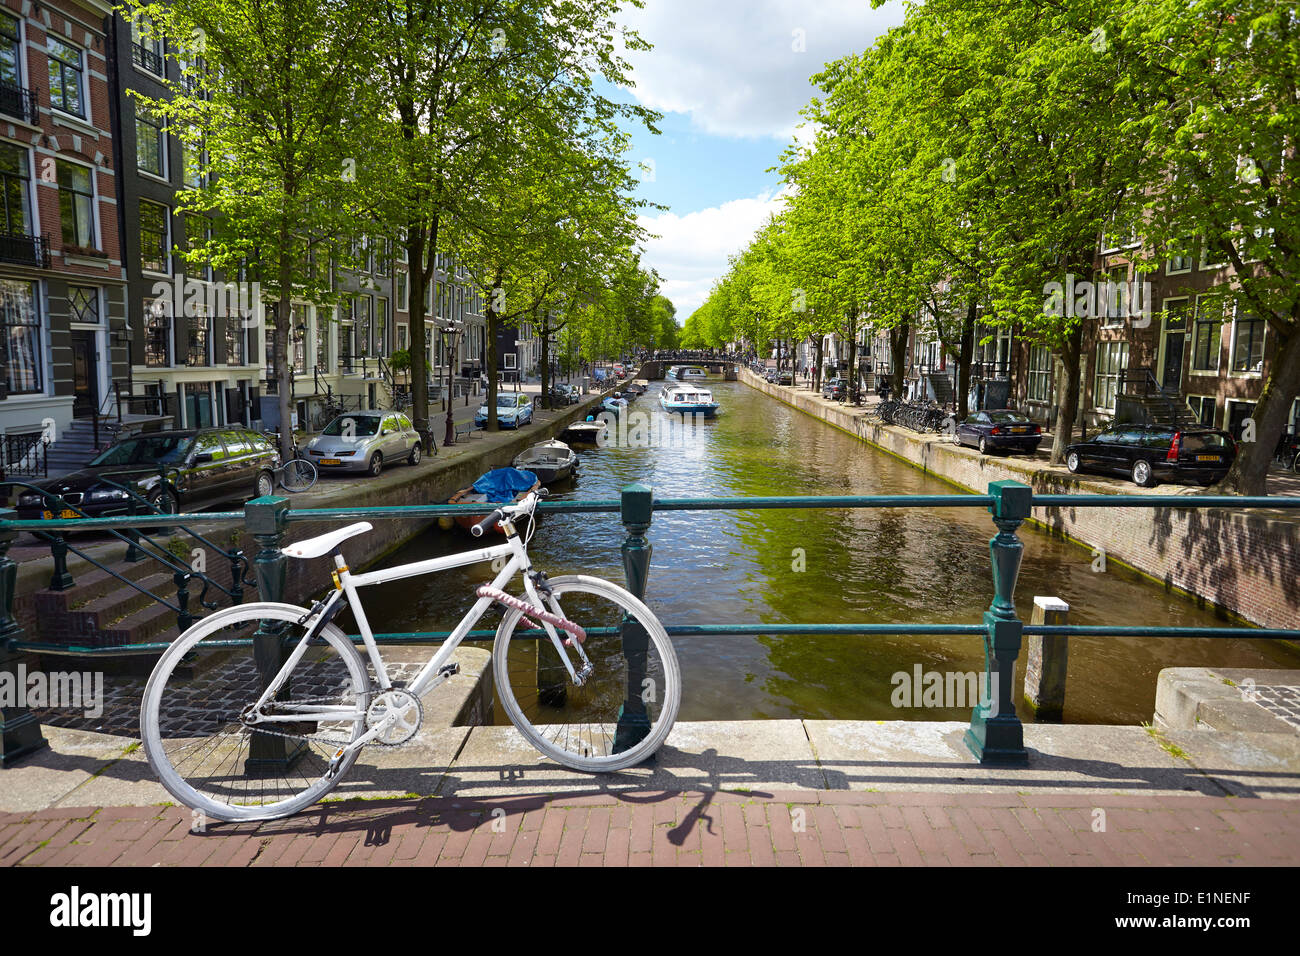 Blick auf Fahrrad und Kanal - Amsterdam, Holland-Niederlande Stockbild